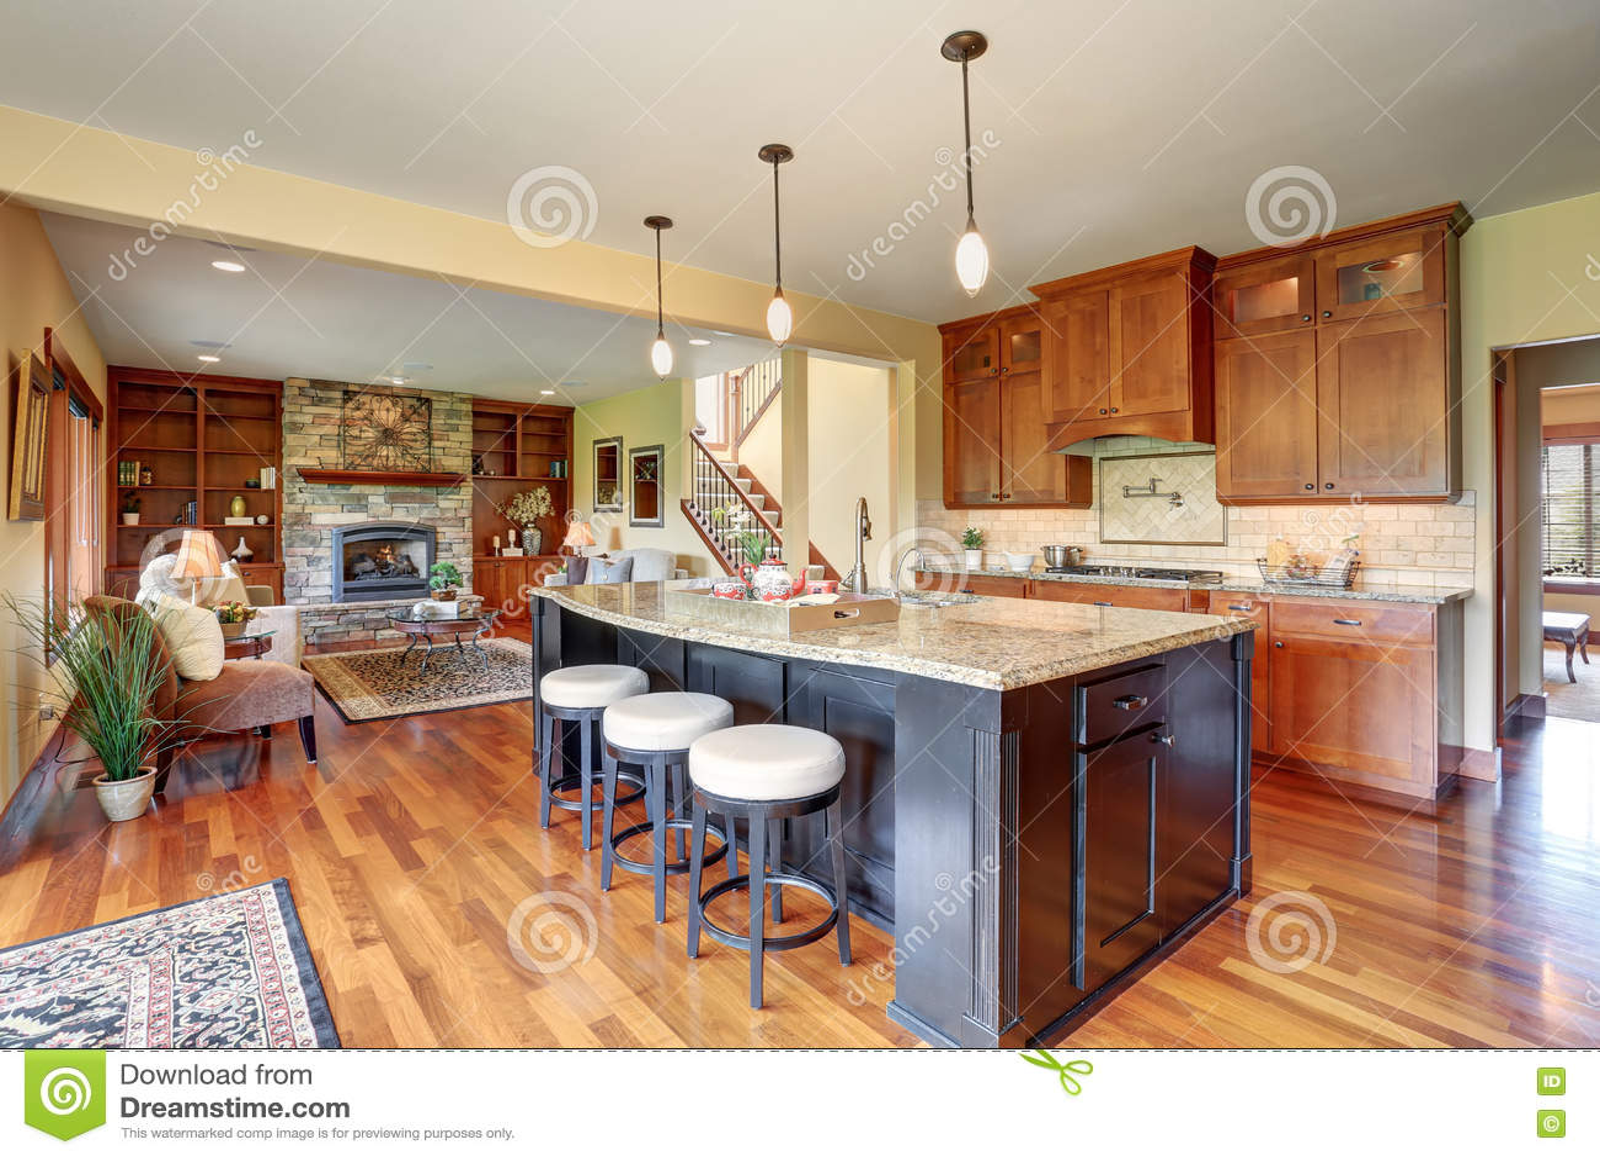 small kitchen plans best design books 与空心肋板计划 客厅看法的小厨房区域库存图片 图片包括有装备 硬木 客厅看法的小厨房区域